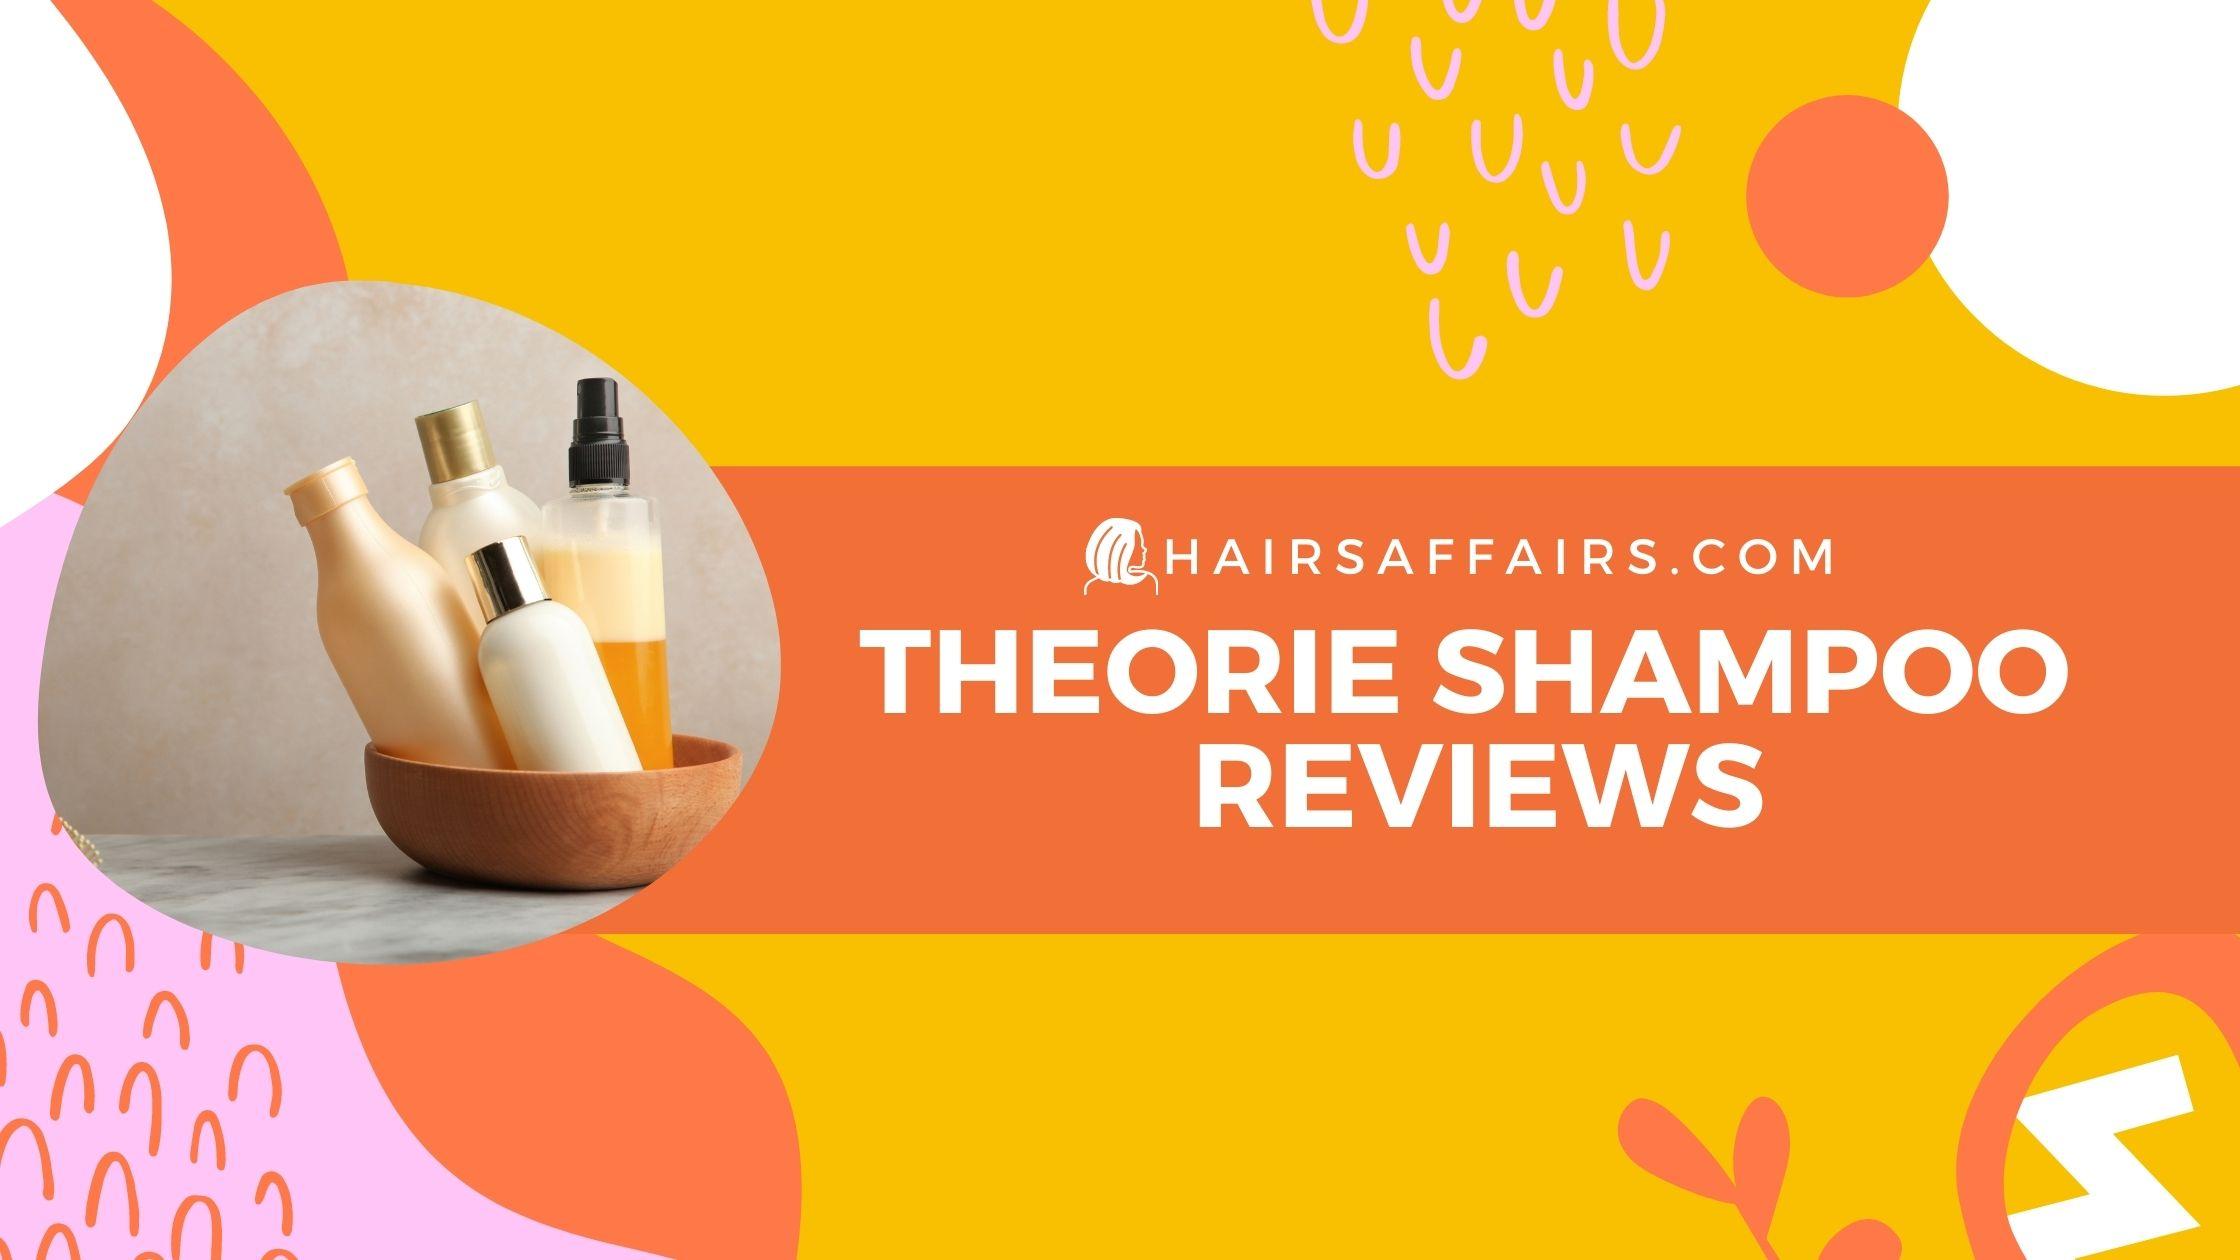 HA-theorie-shampoo-reviews